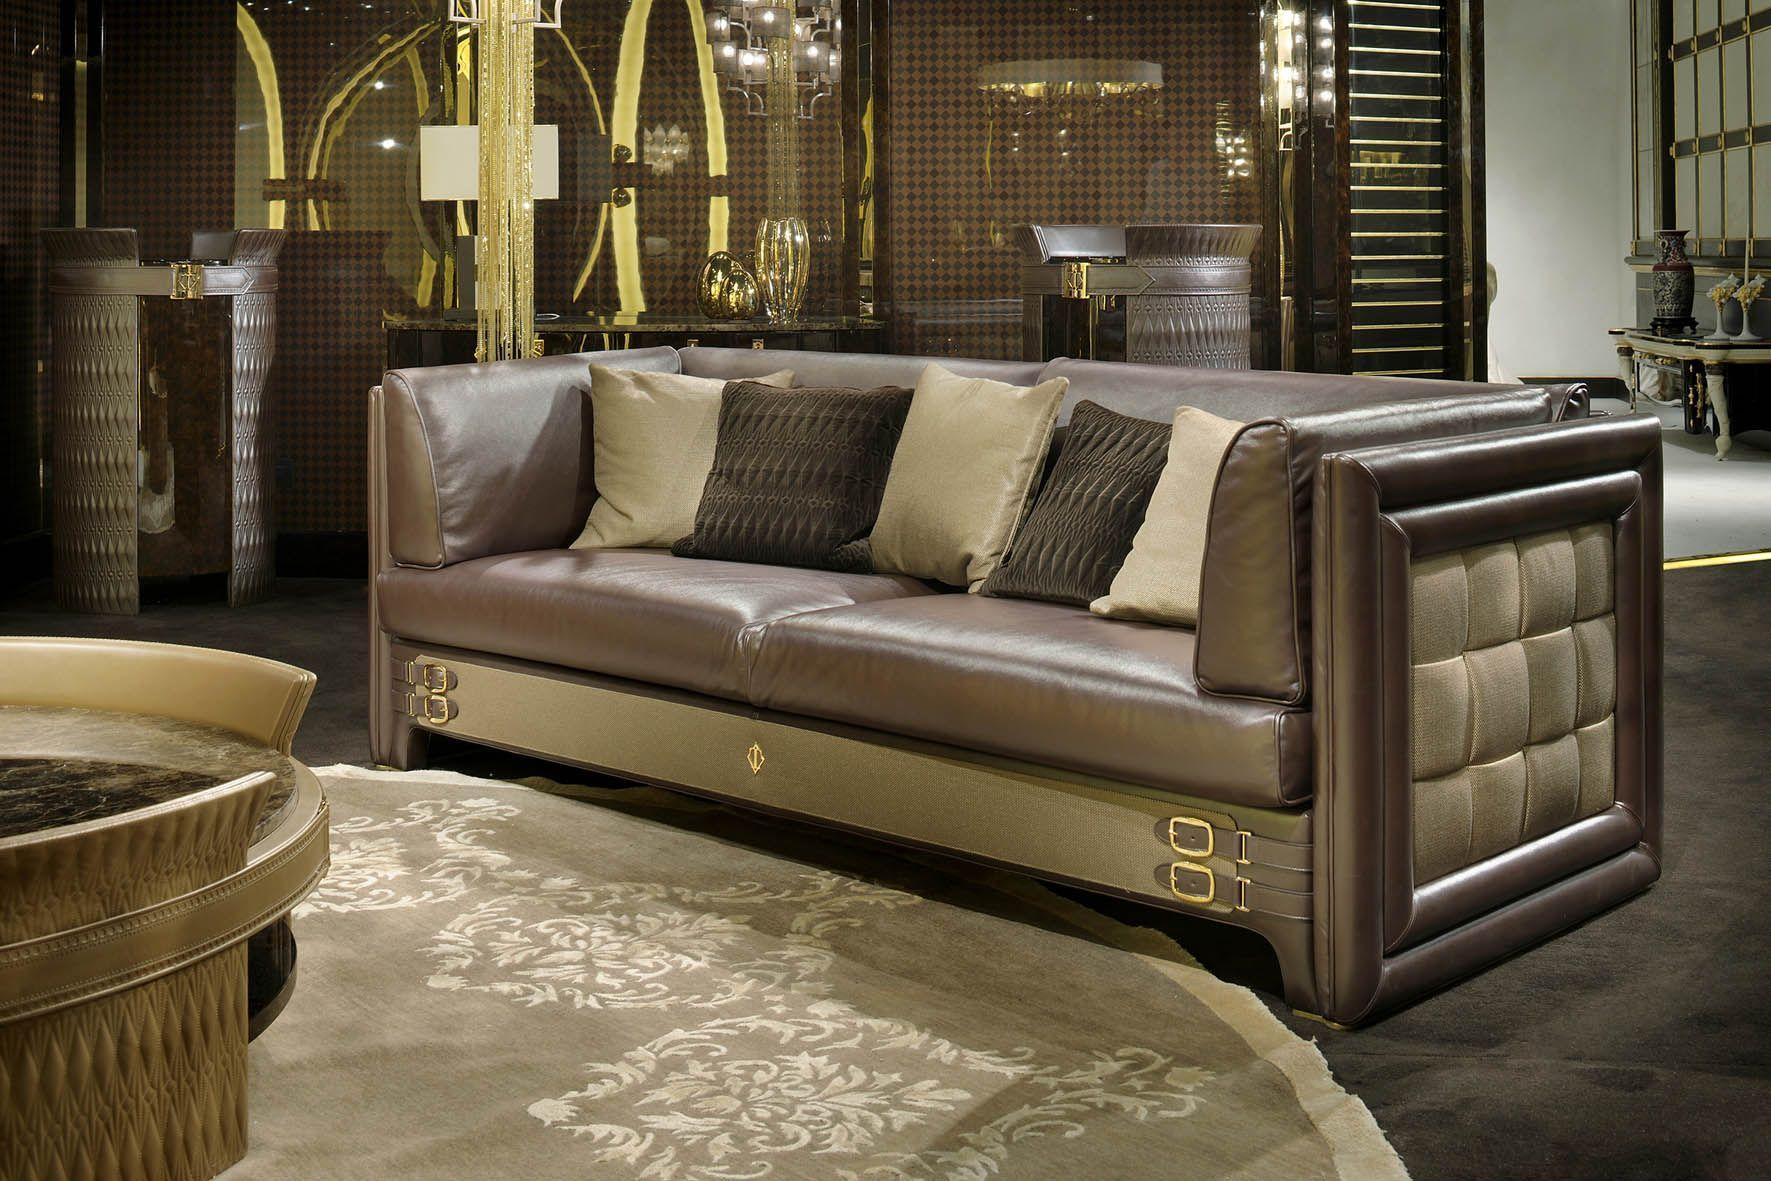 Italian Furniture For Exclusive And Modern Design Koltuk Italyanskaya Mebel Dizajn Interera Mebel